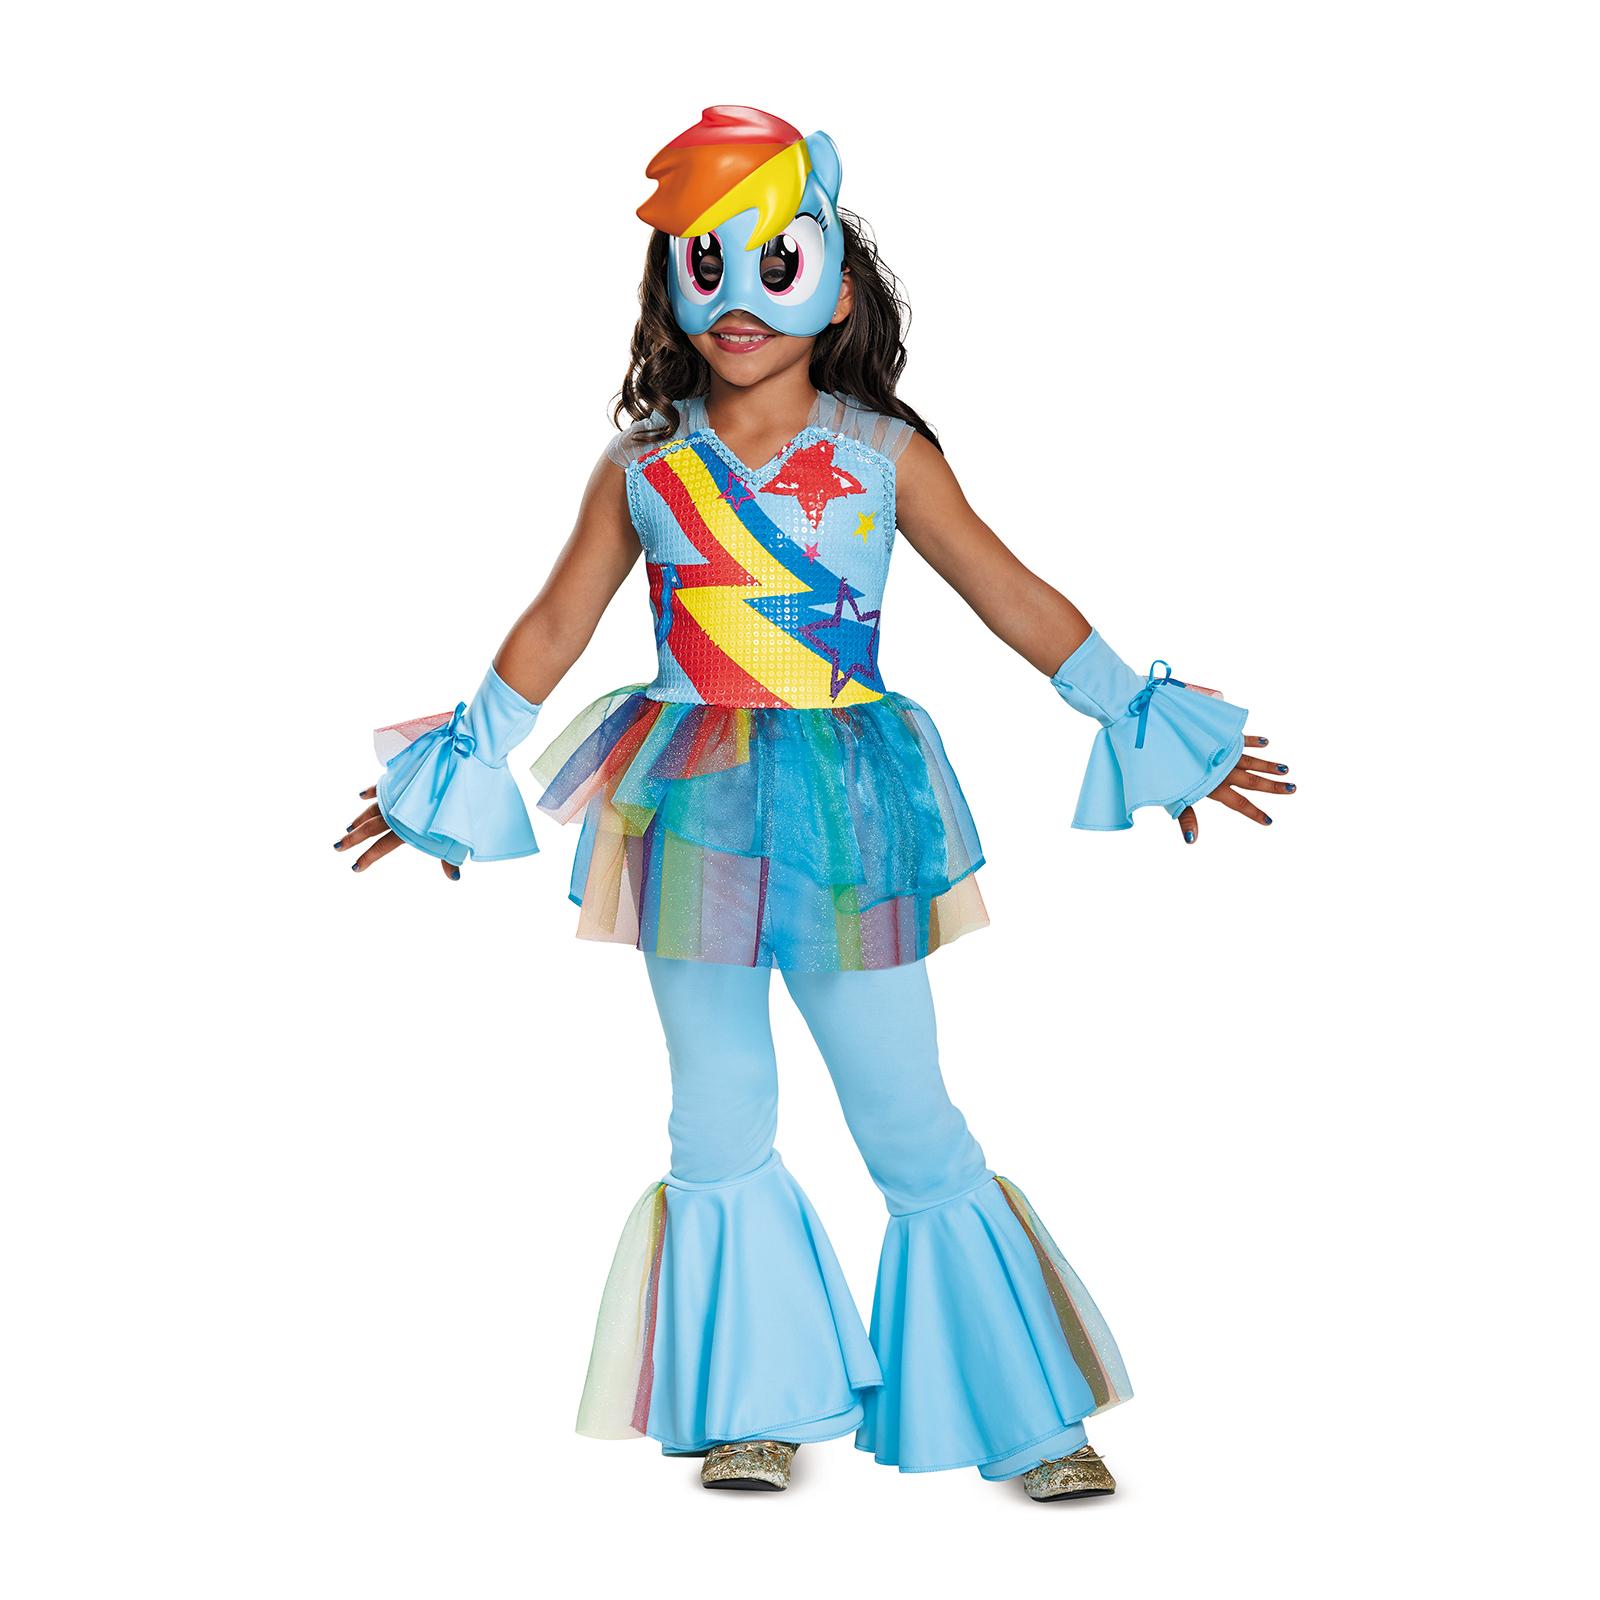 Rainbow Dash costume - craftinessisnotoptional.com